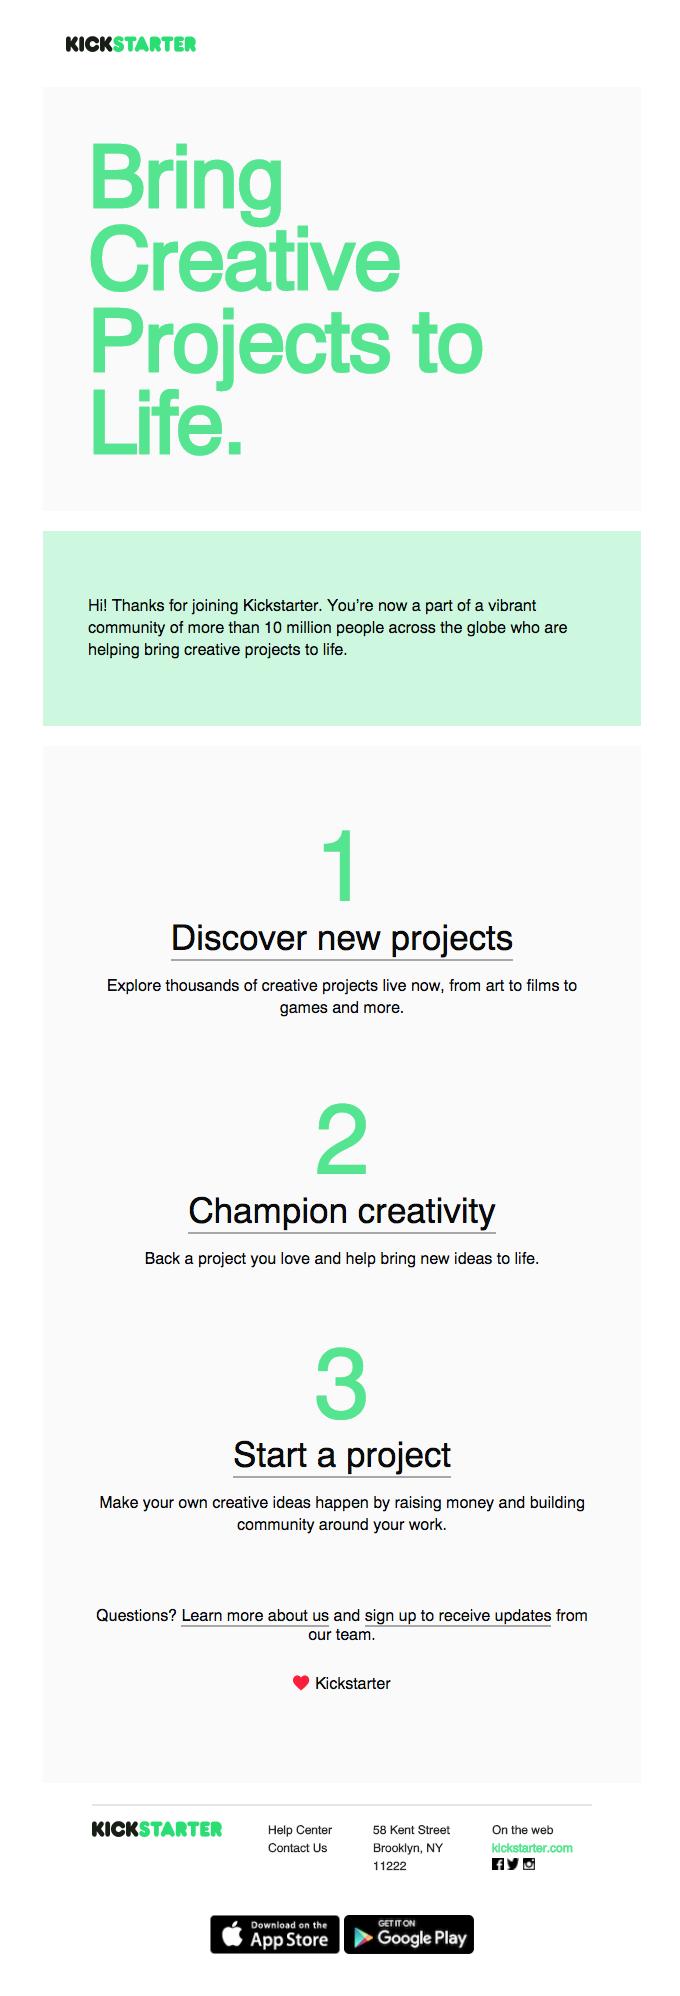 Welcome to Kickstarter!